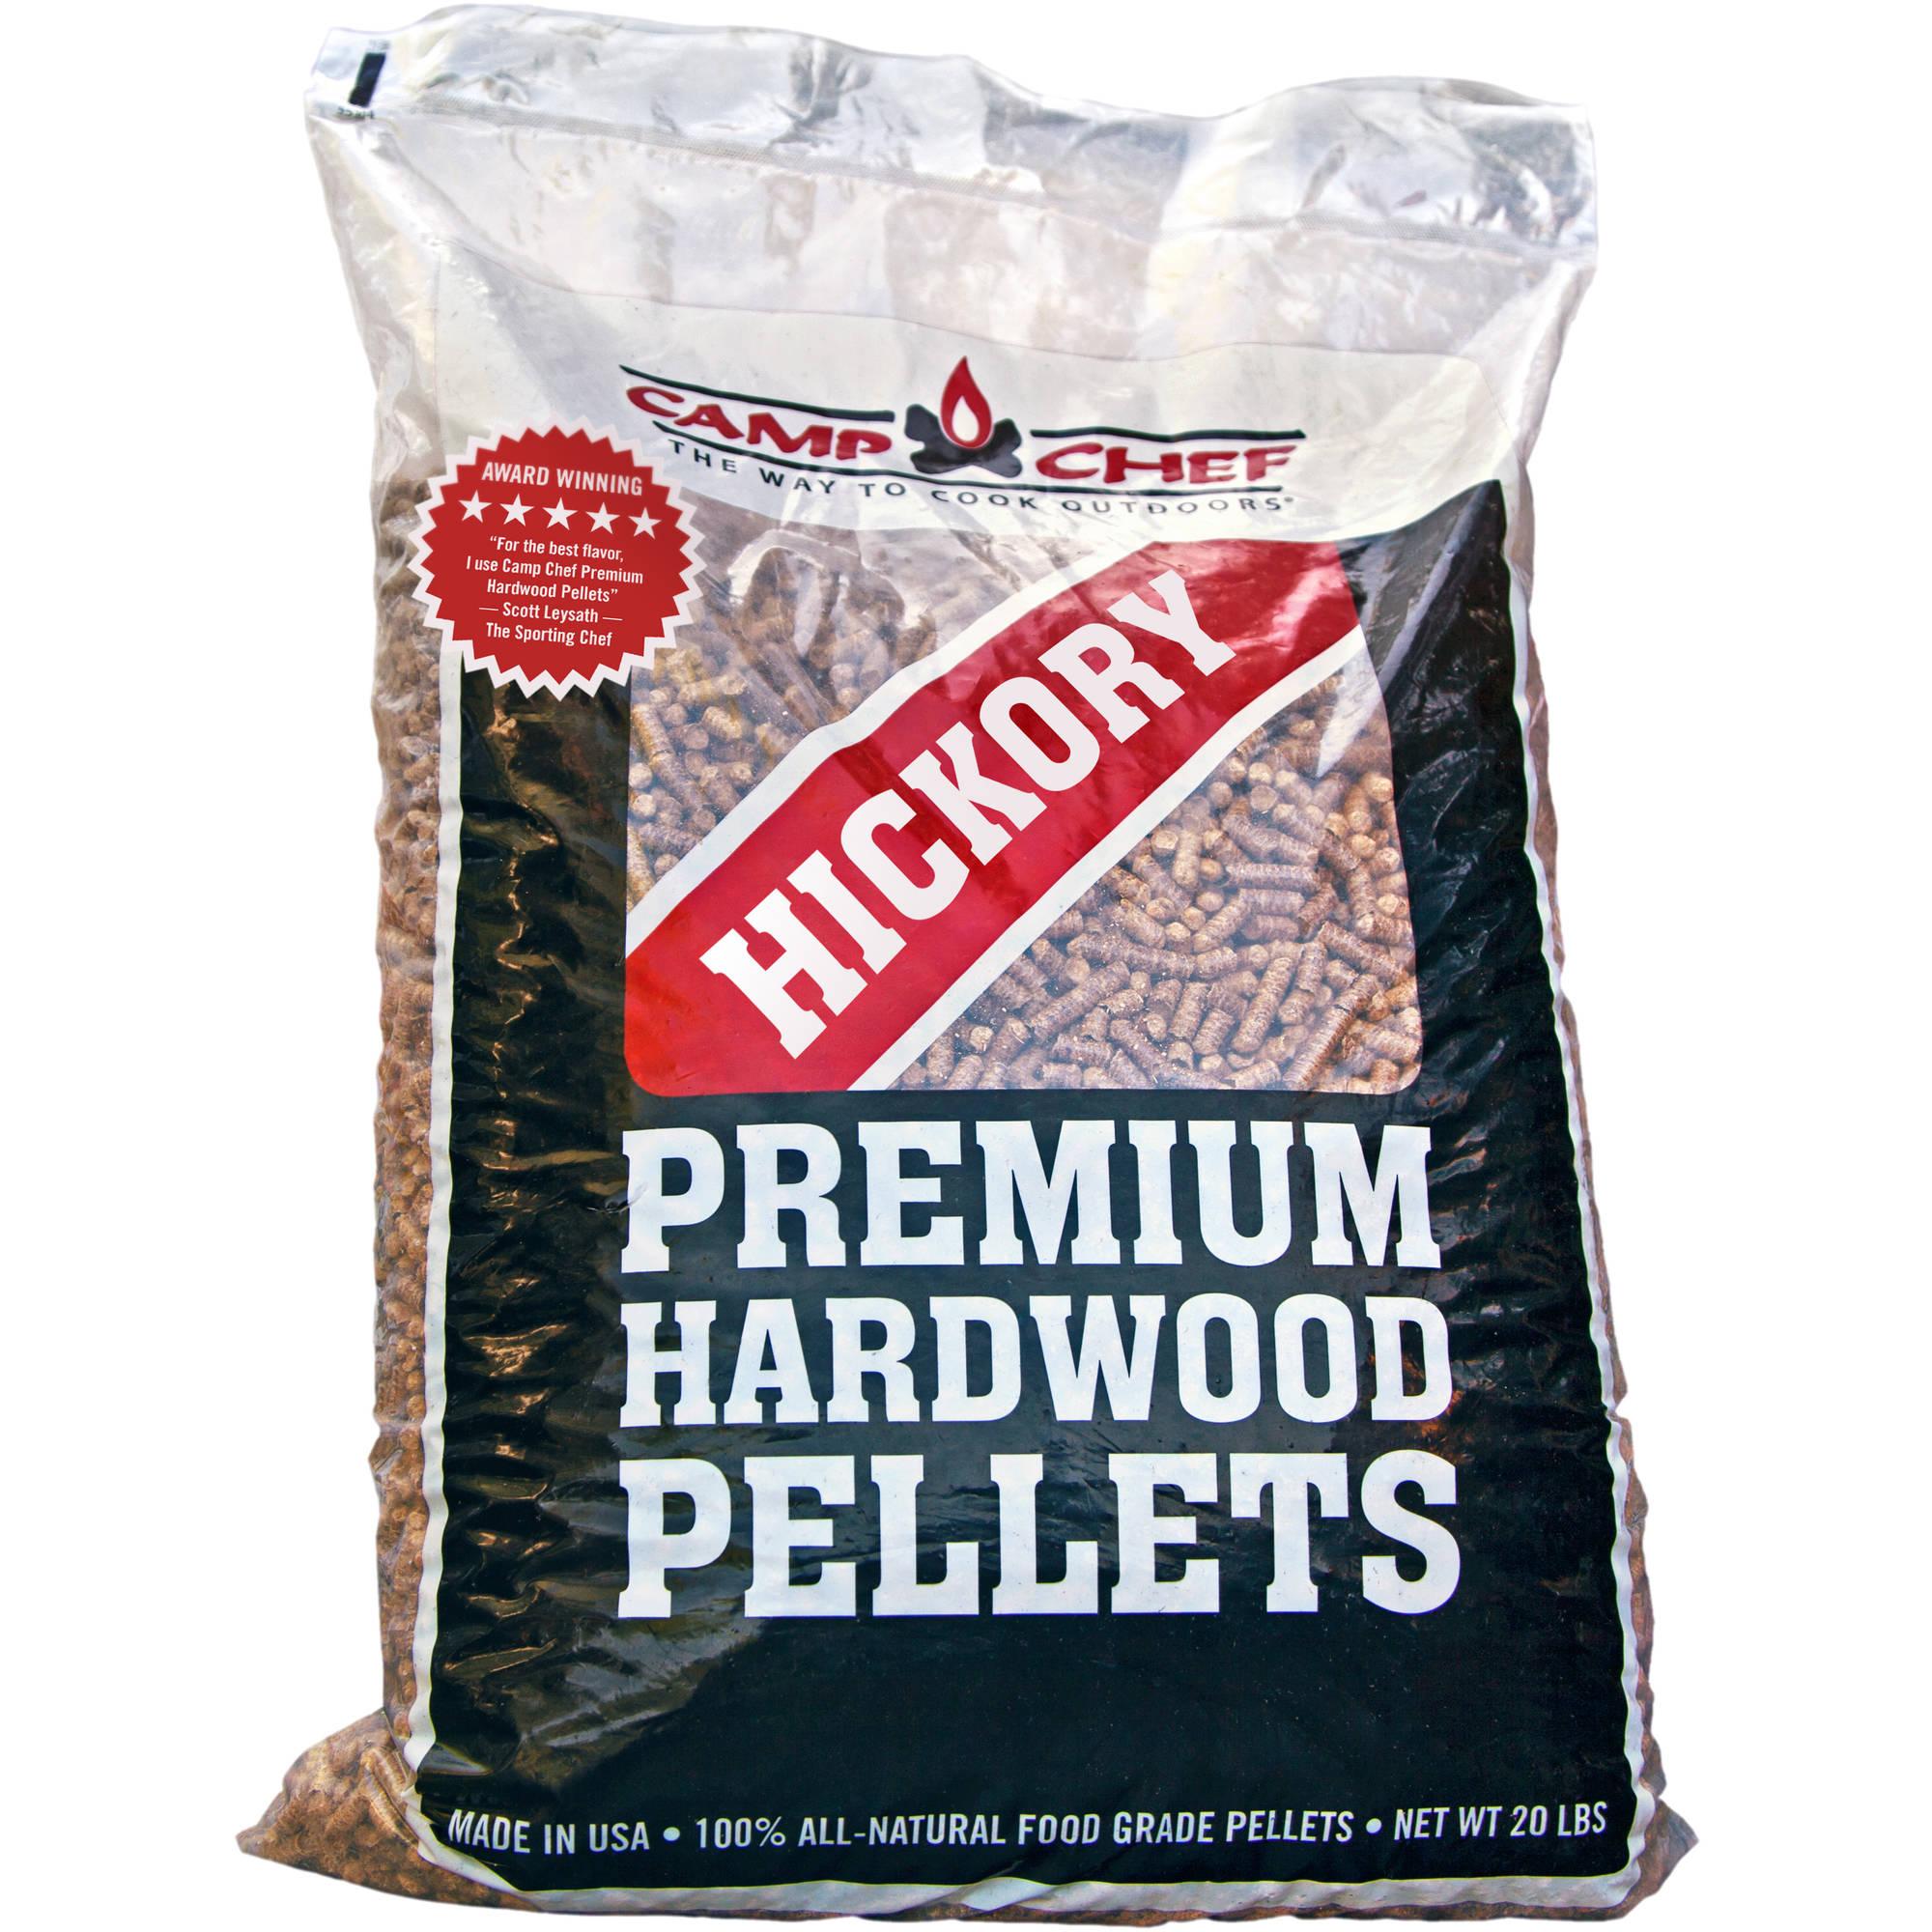 Camp Chef Hickory Premium Hardwood Pellets 20 lbs $9.23